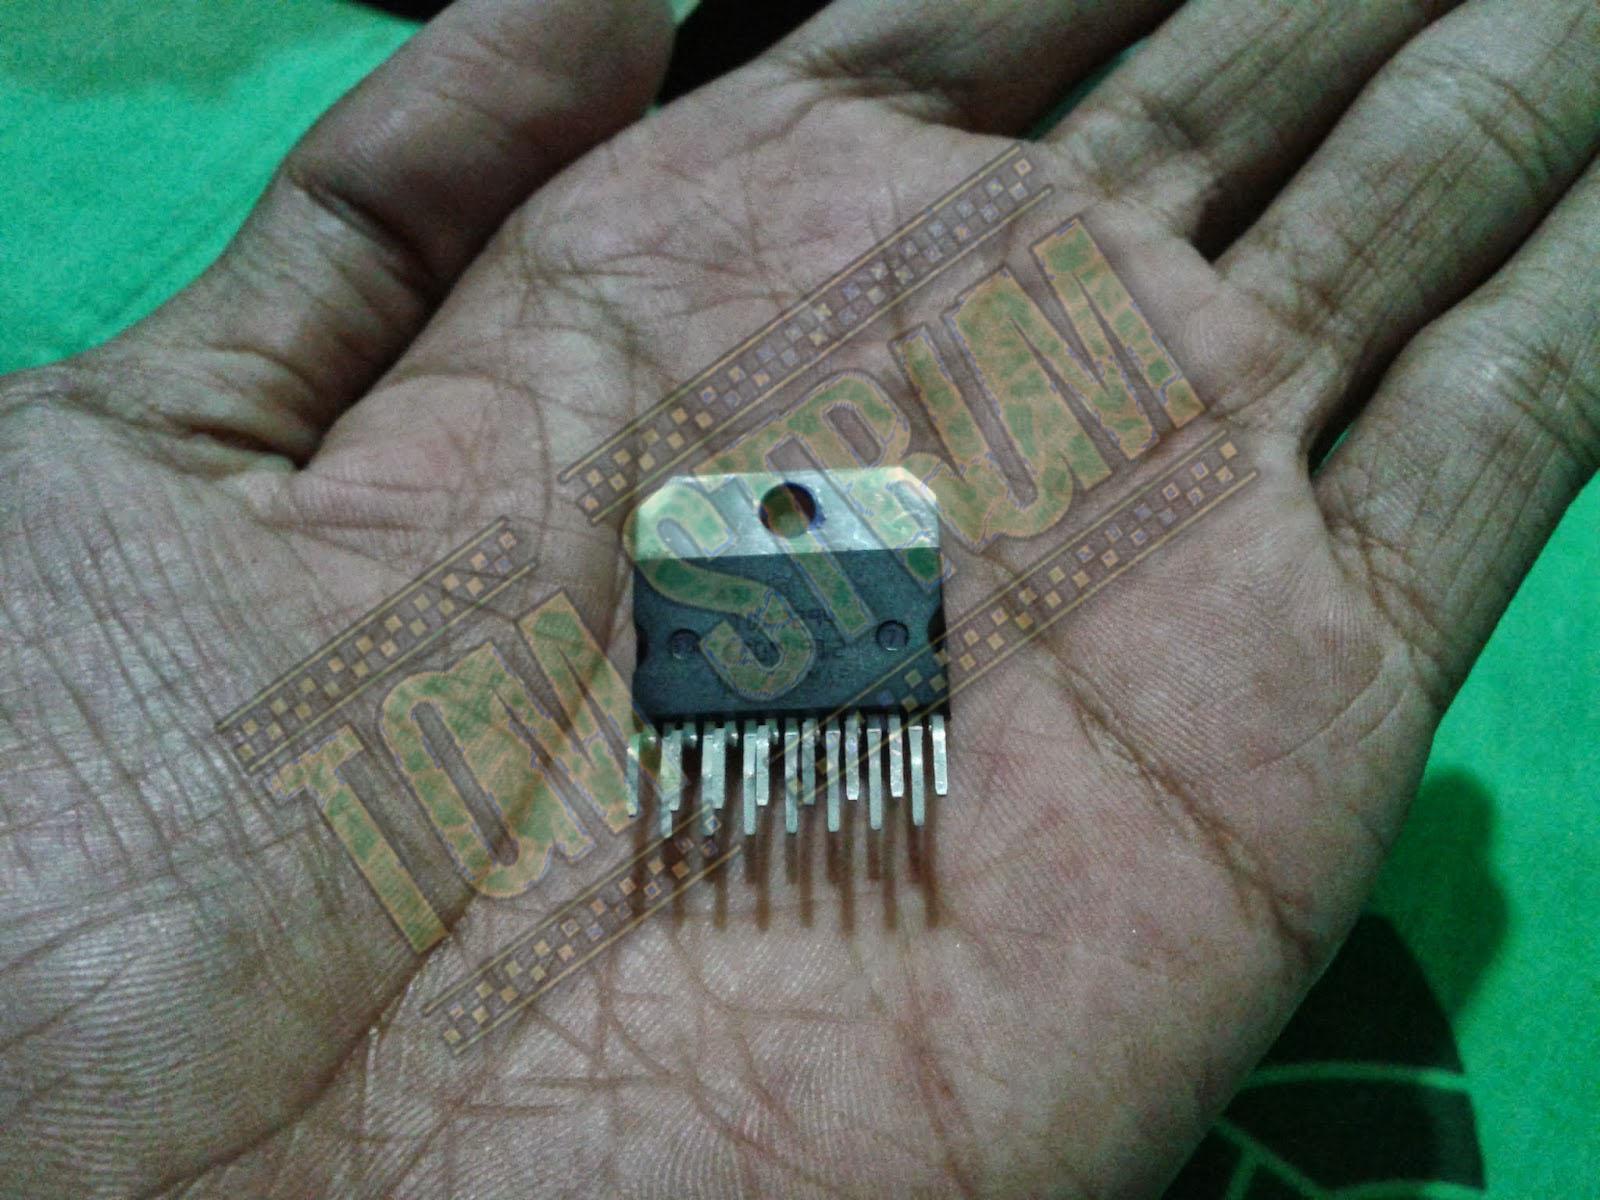 Haryo Toms Tda 7295 7294 Watt Audio Power Amplifier Circuit Using Tda2613 R 1 Ohm 5 Buah Atau 2 Diparalel Kapasitor Mkmmkp 22uf Elco 47uf Jika Tak Adajangan Gunakan Mylar